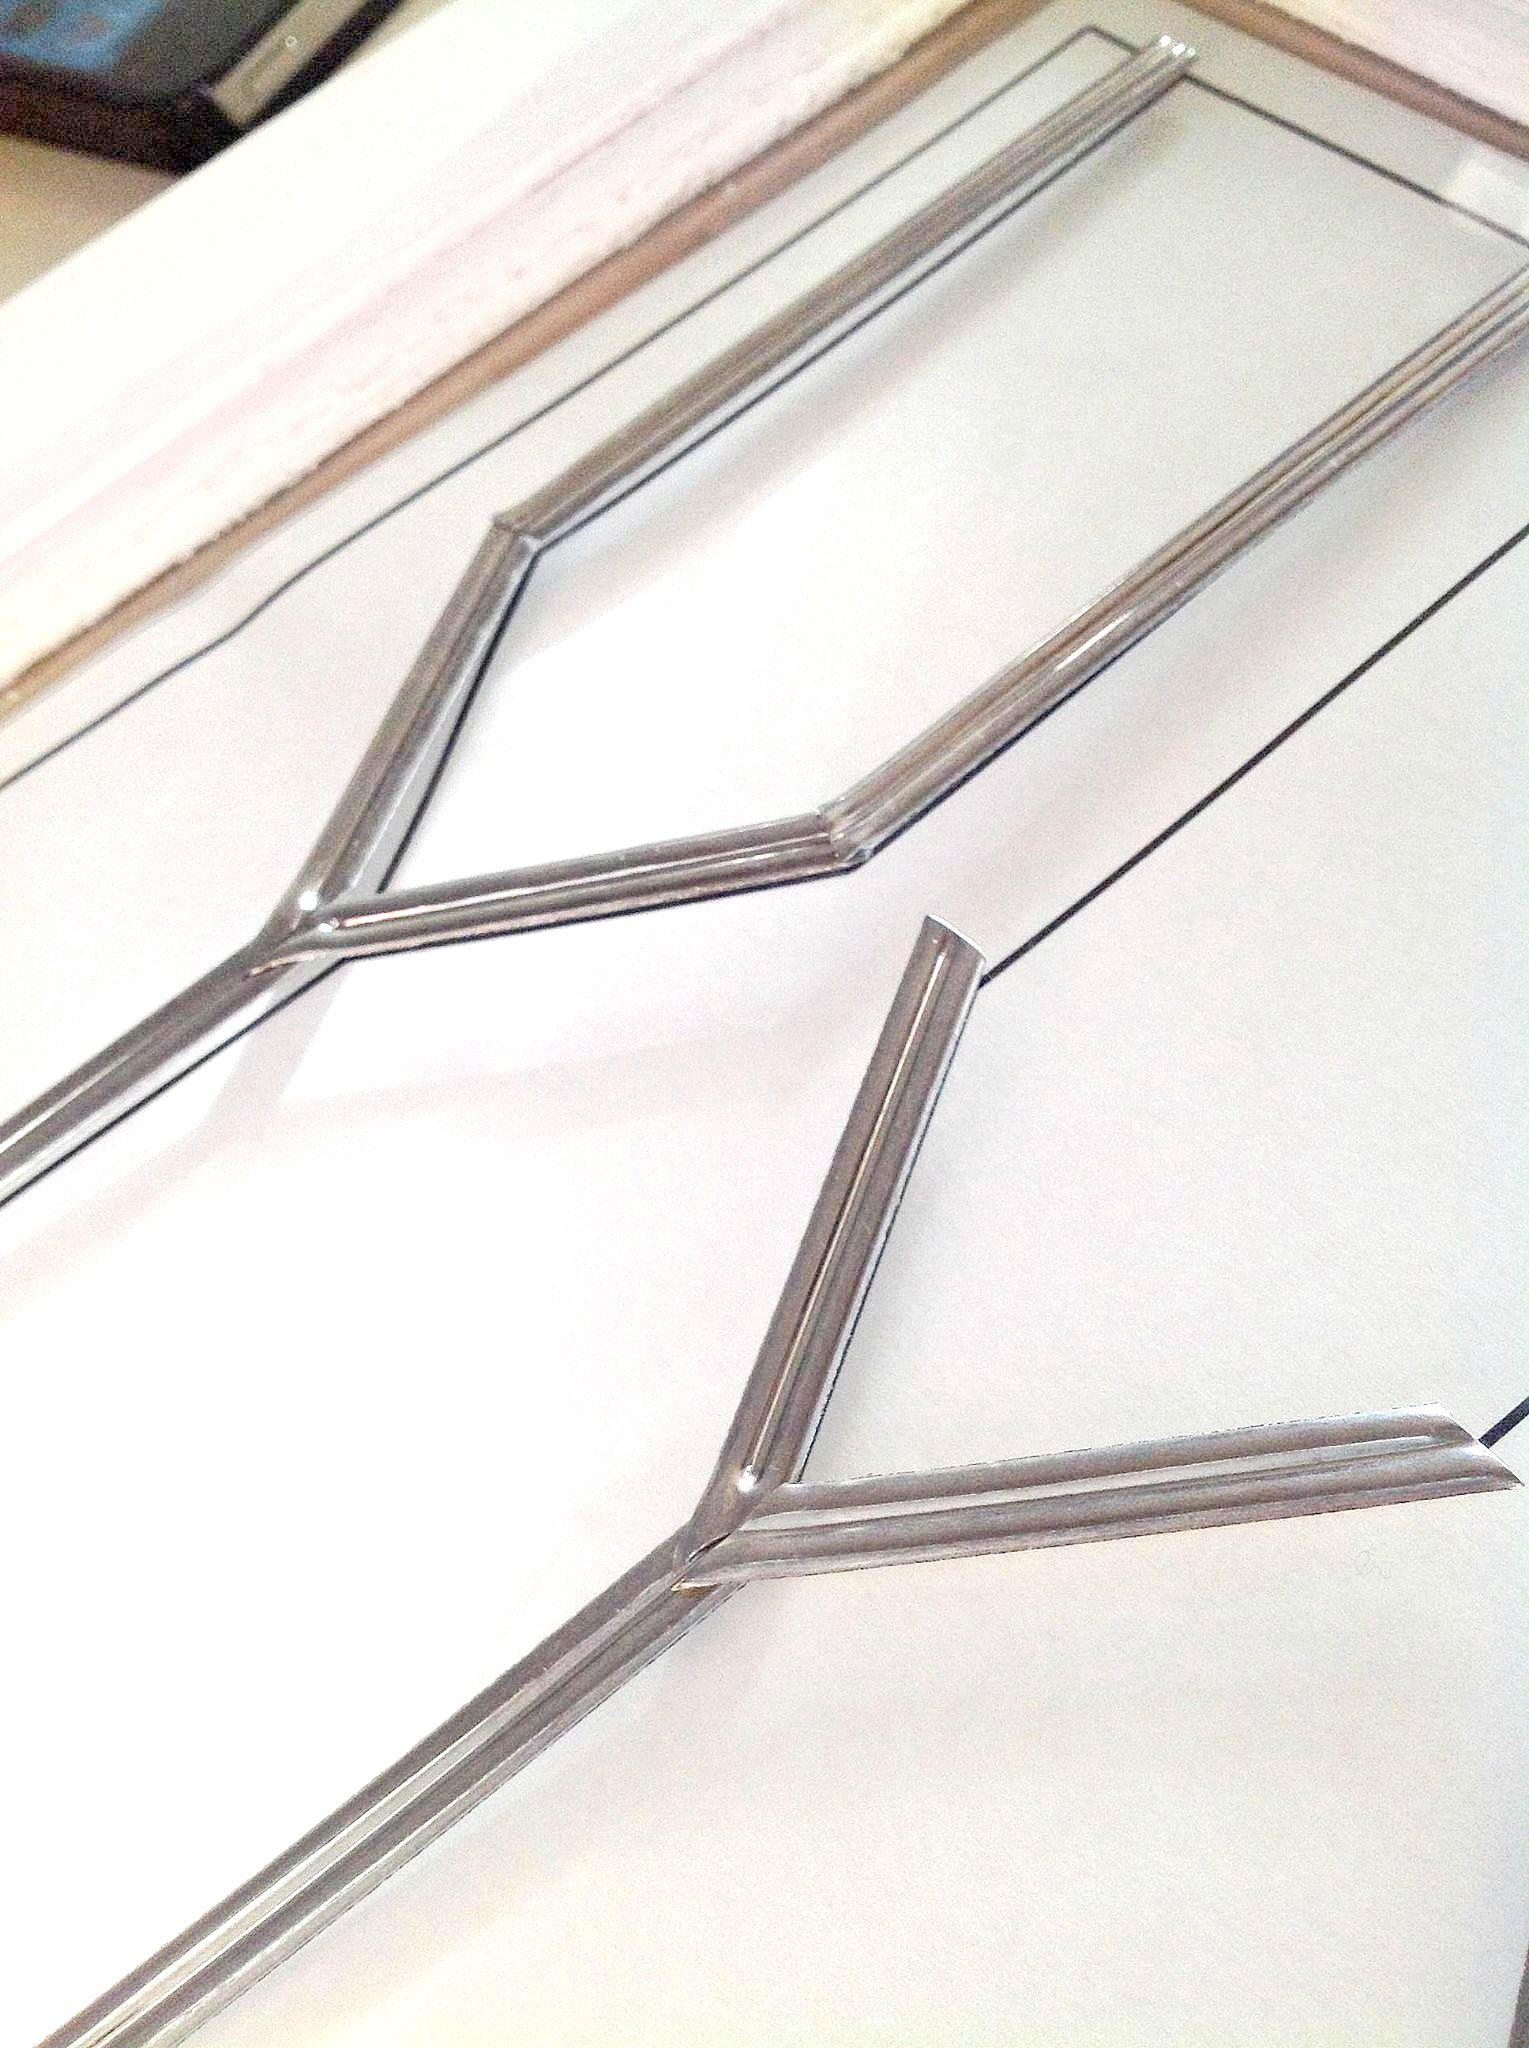 Diy Faux Leaded Glass Cabinets Leaded Glass Cabinets Leaded Glass Glass Windows Diy